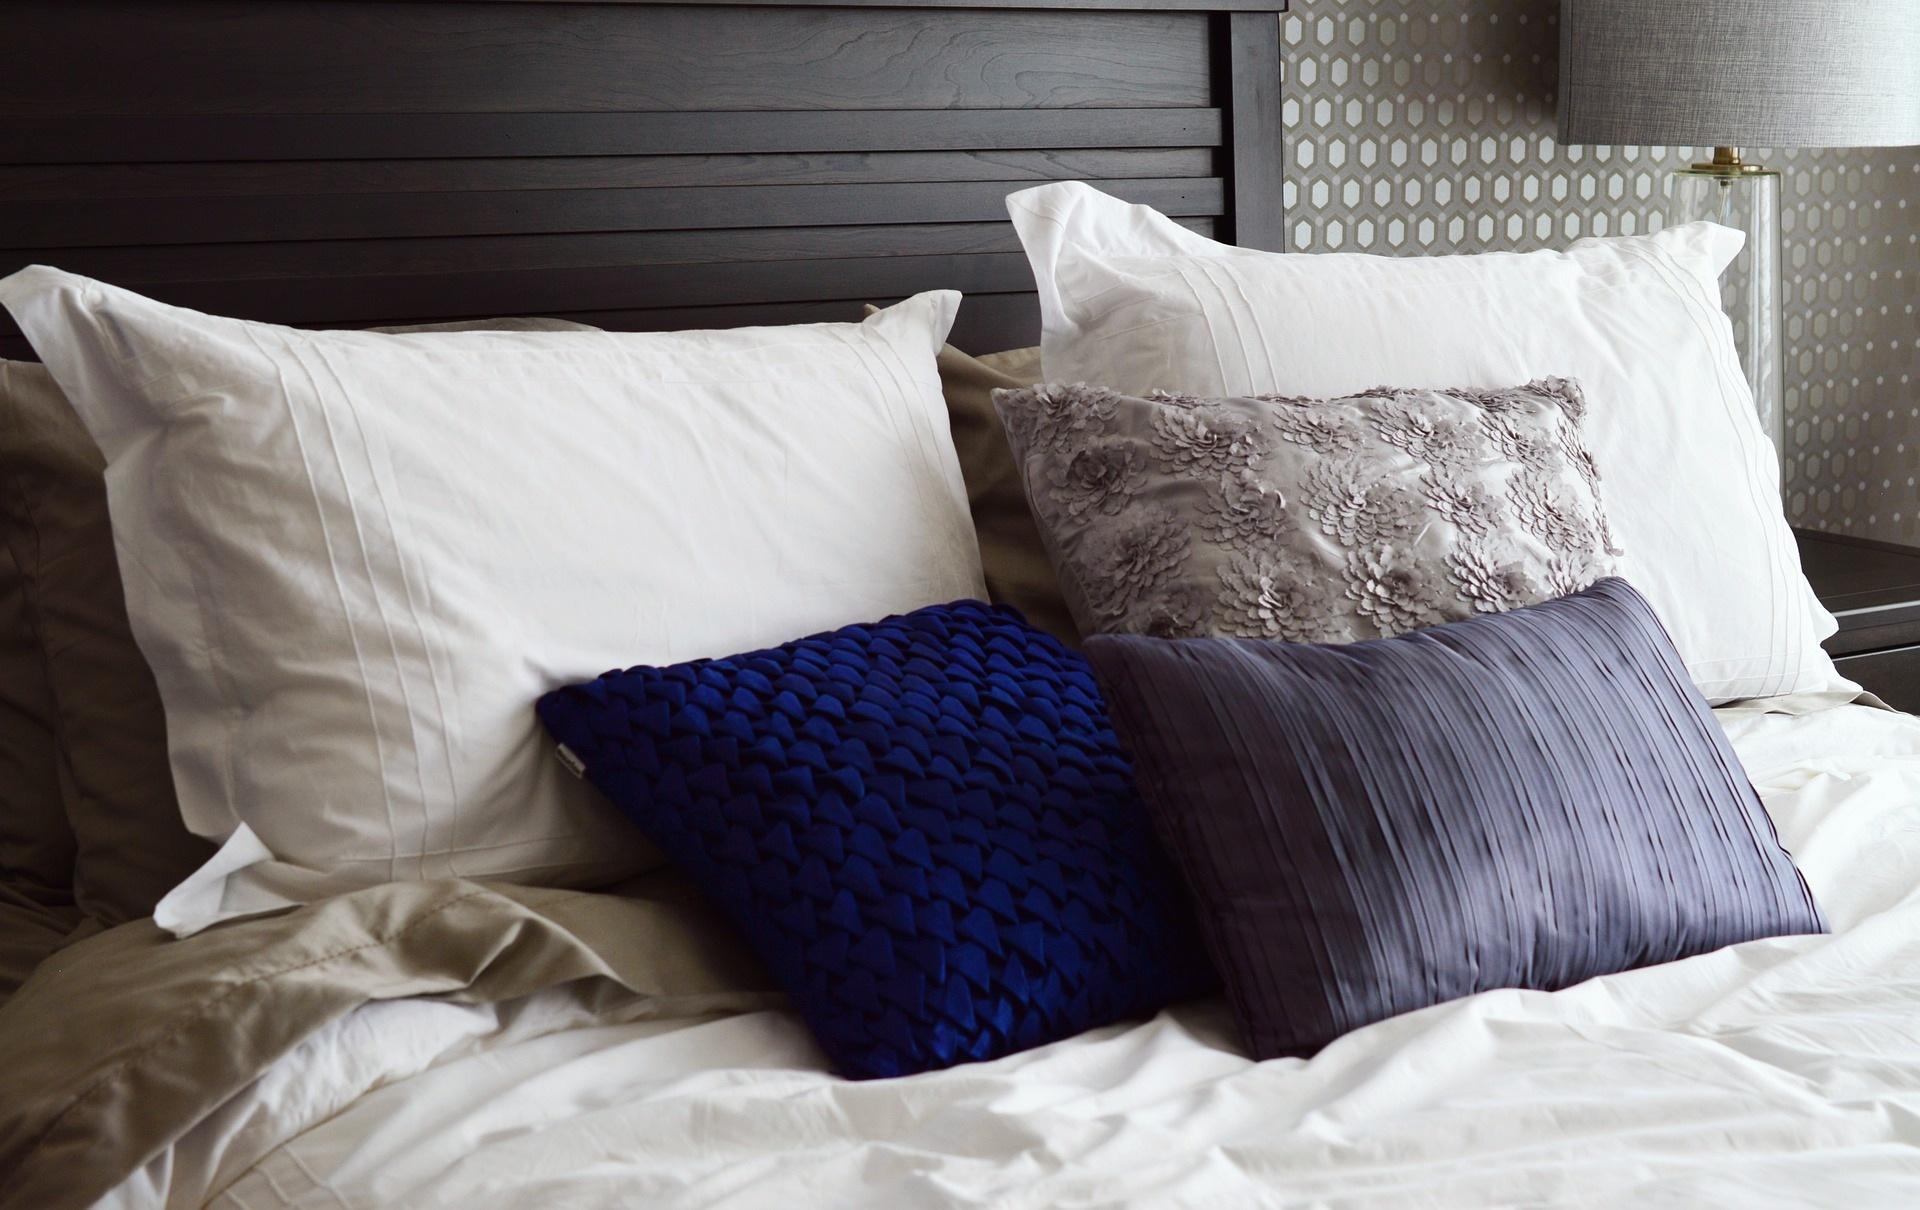 bed-2167288_1920.jpg